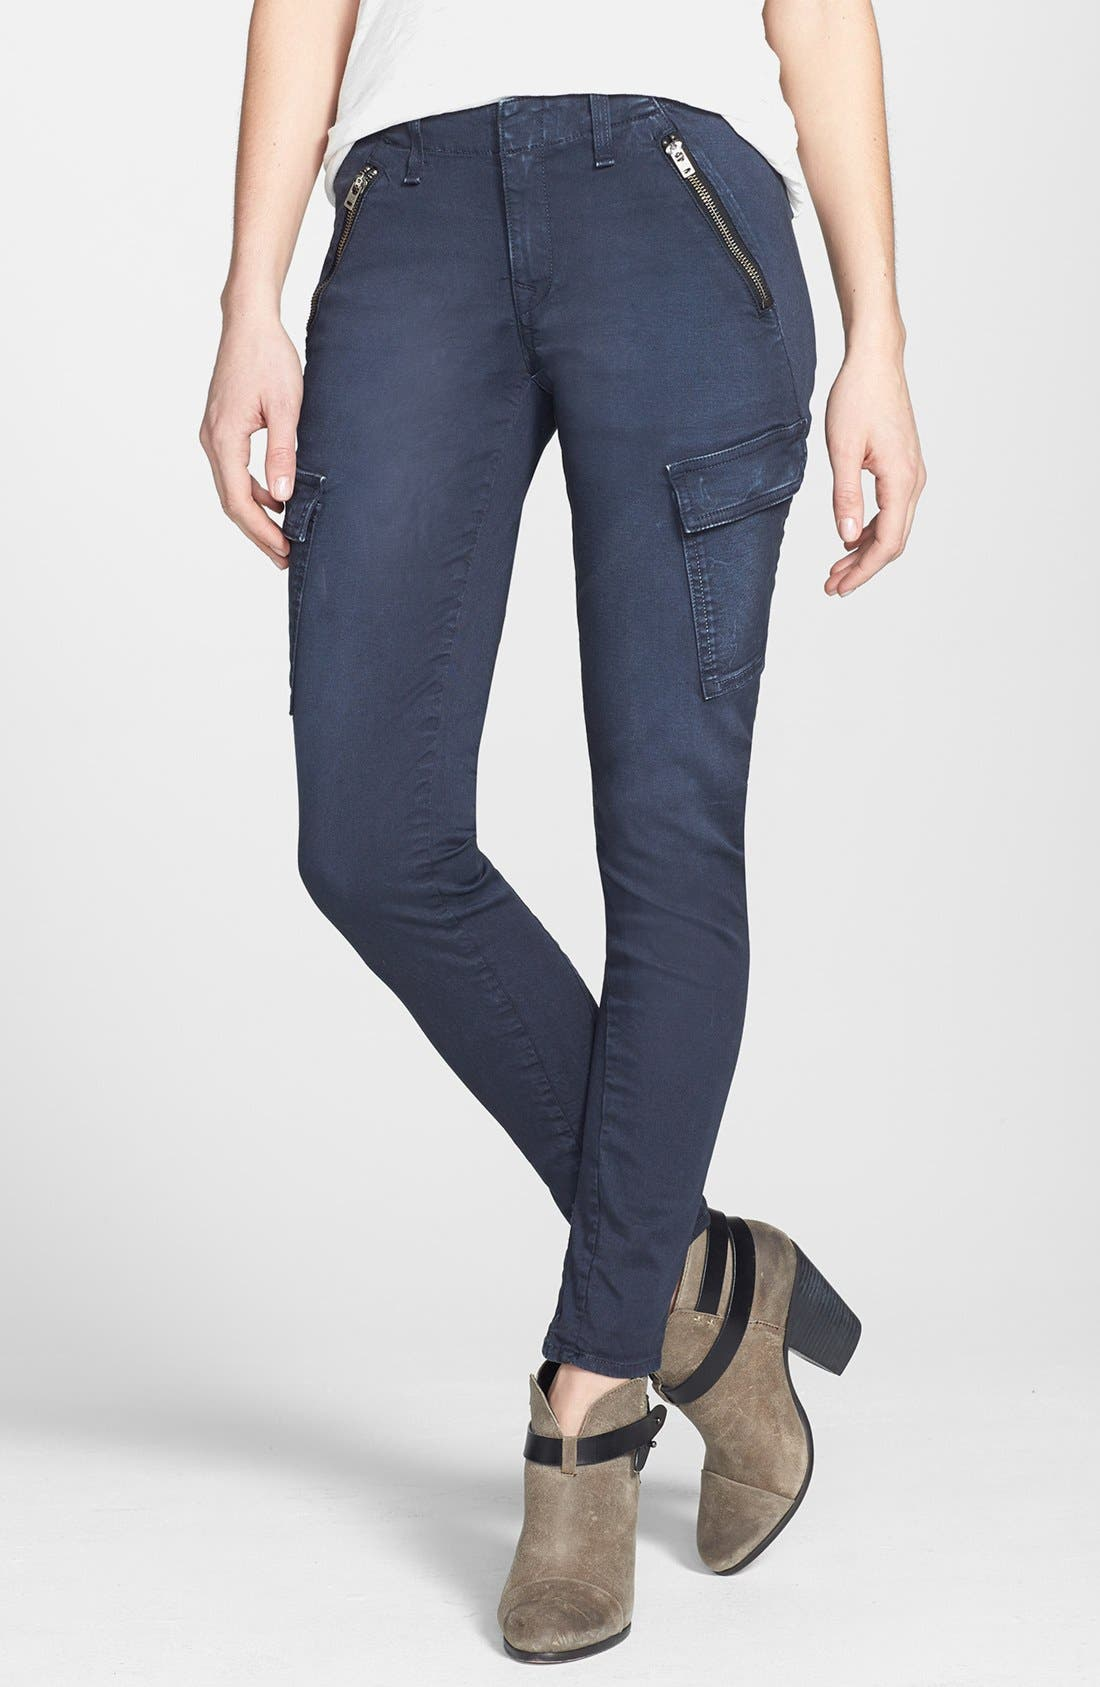 Alternate Image 1 Selected - rag & bone/JEAN 'Bowery' Cargo Skinny Jeans (Distressed Navy)